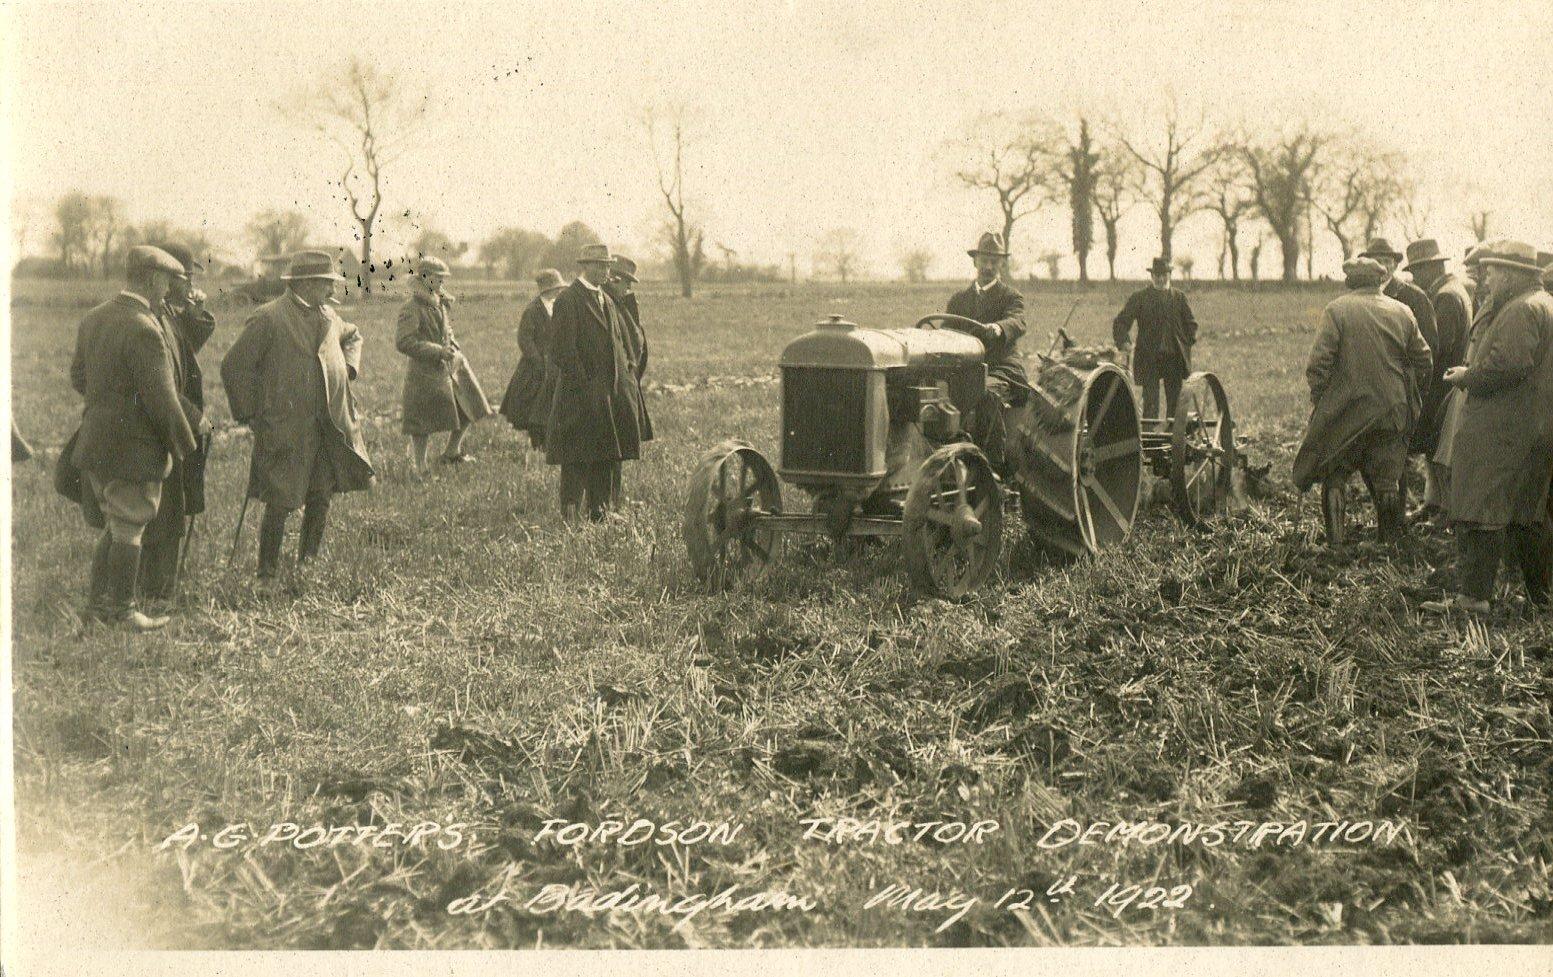 Potter's Tractor Demo, Badingham 1922